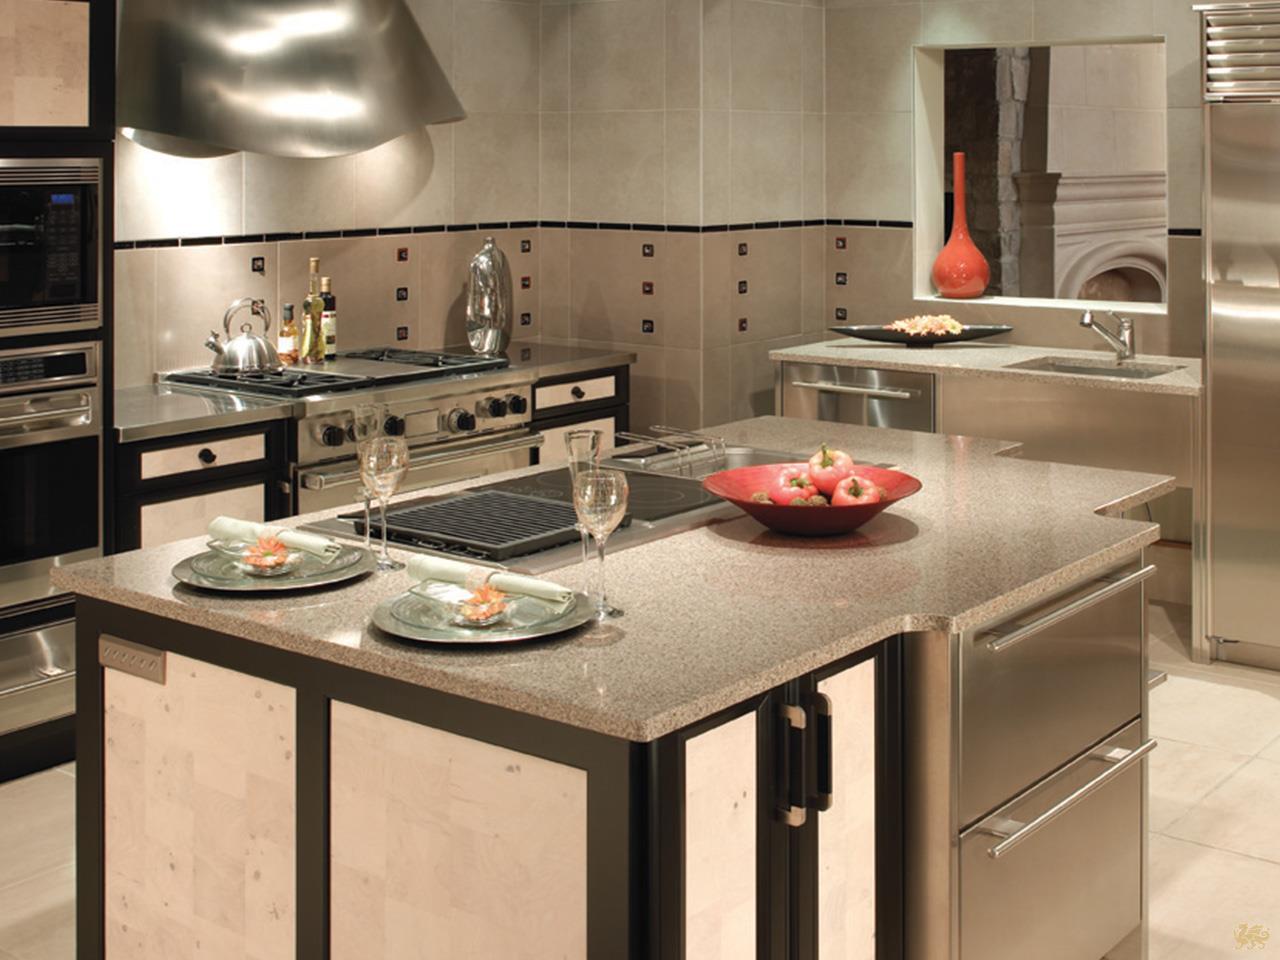 Carlisle Kitchen Countertop